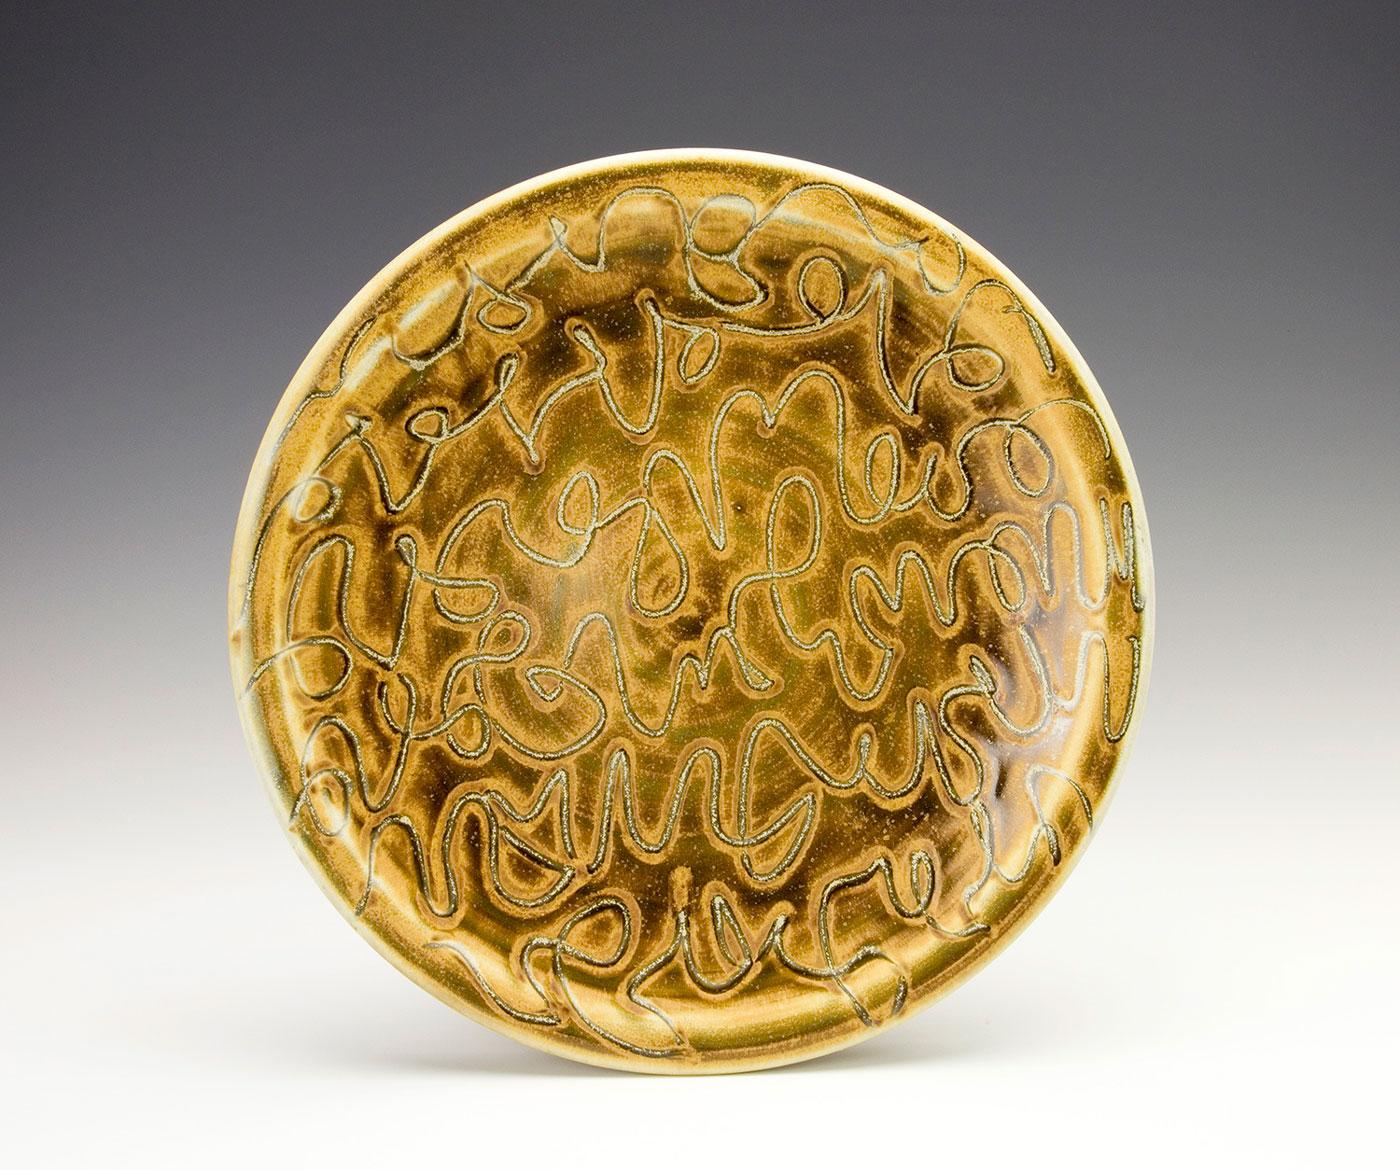 Abstract-Bronze-Moka-script-plate-Samantha-Henneke-Seagrove-North-Carolina.jpg